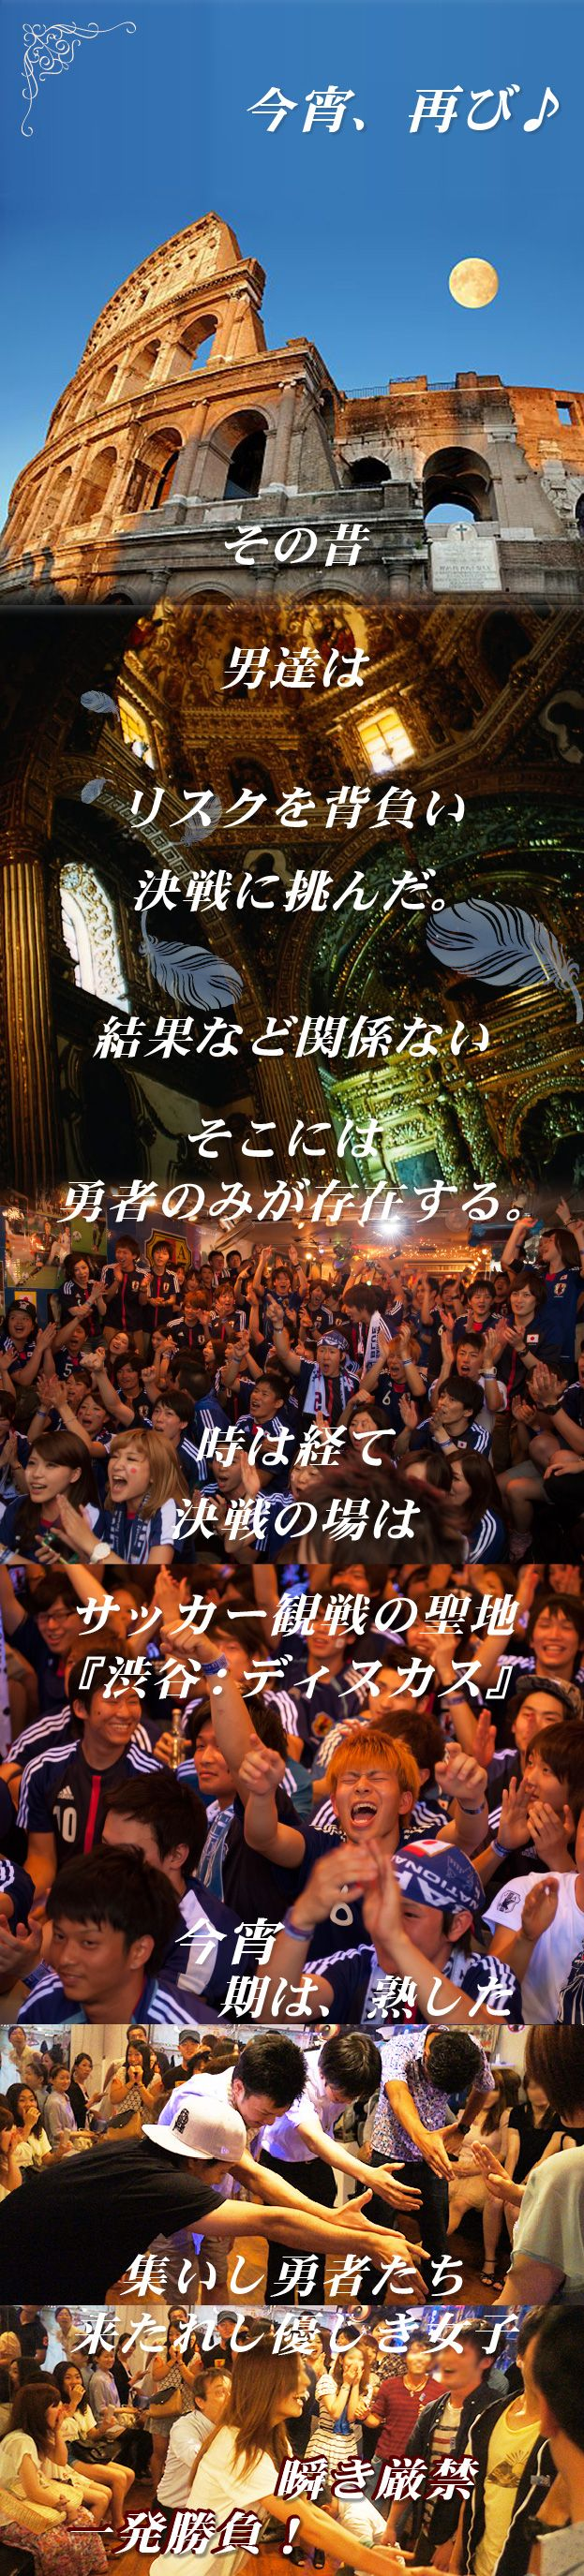 01_onegai_kokuhaku01